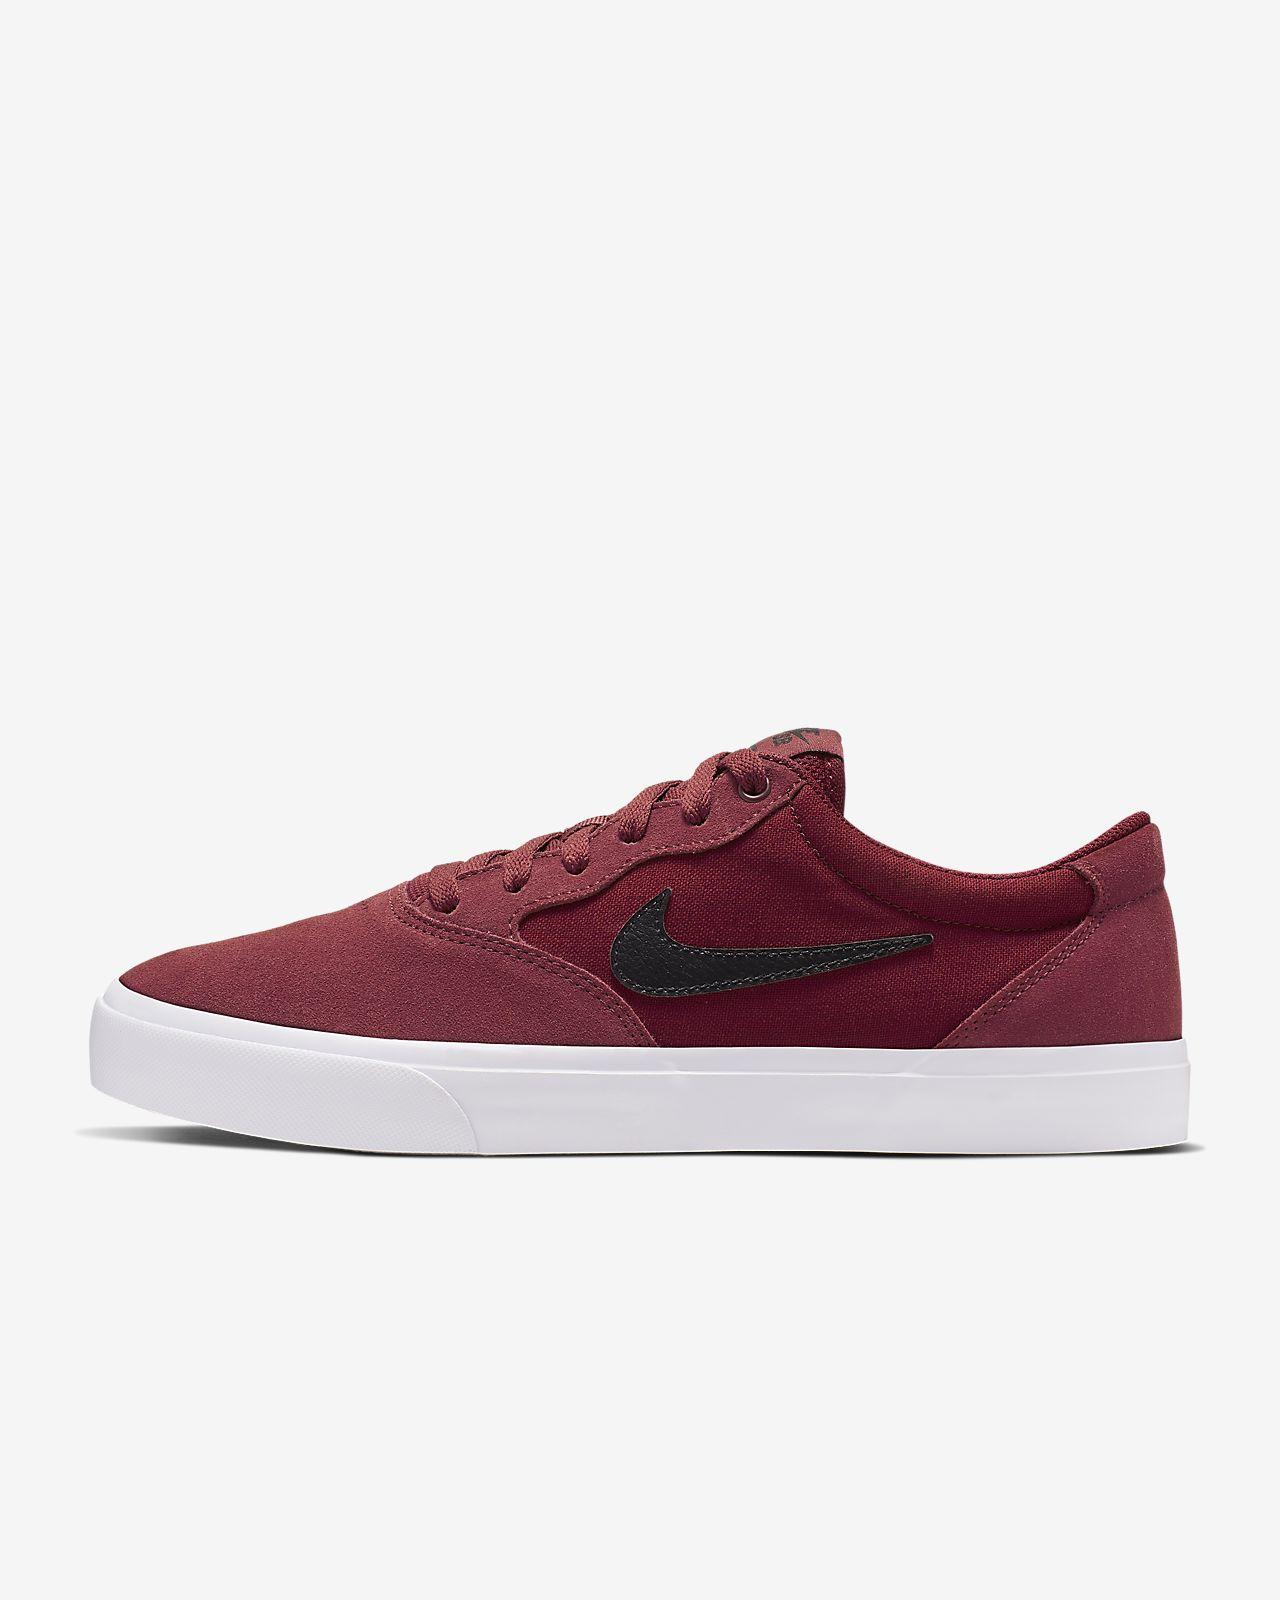 Nike SB Chron Solarsoft Skateboardschuh